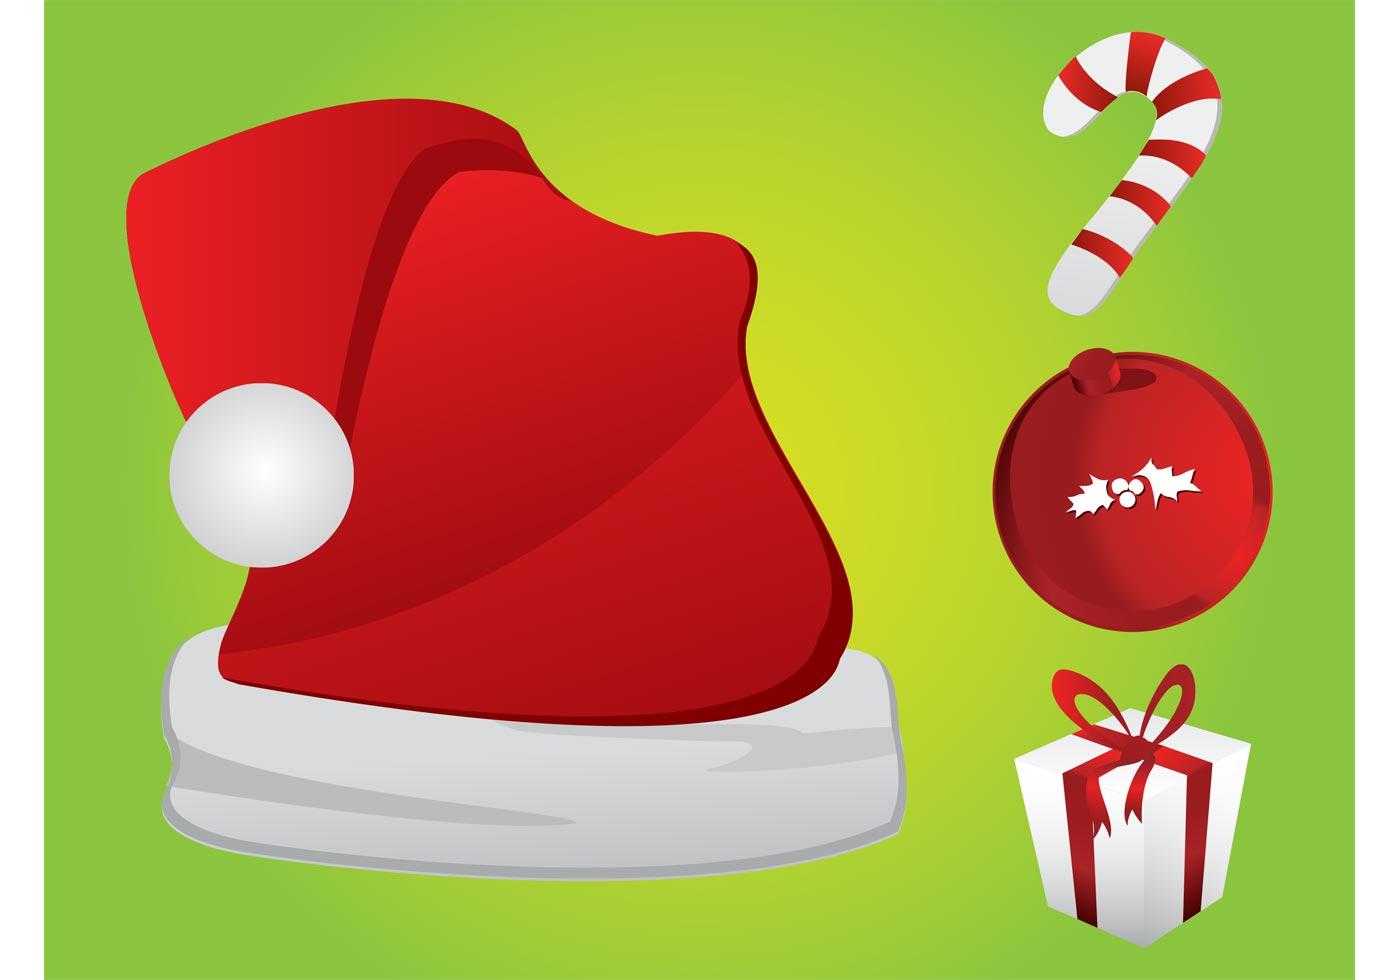 Christmas Symbols - Download Free Vector Art, Stock ...